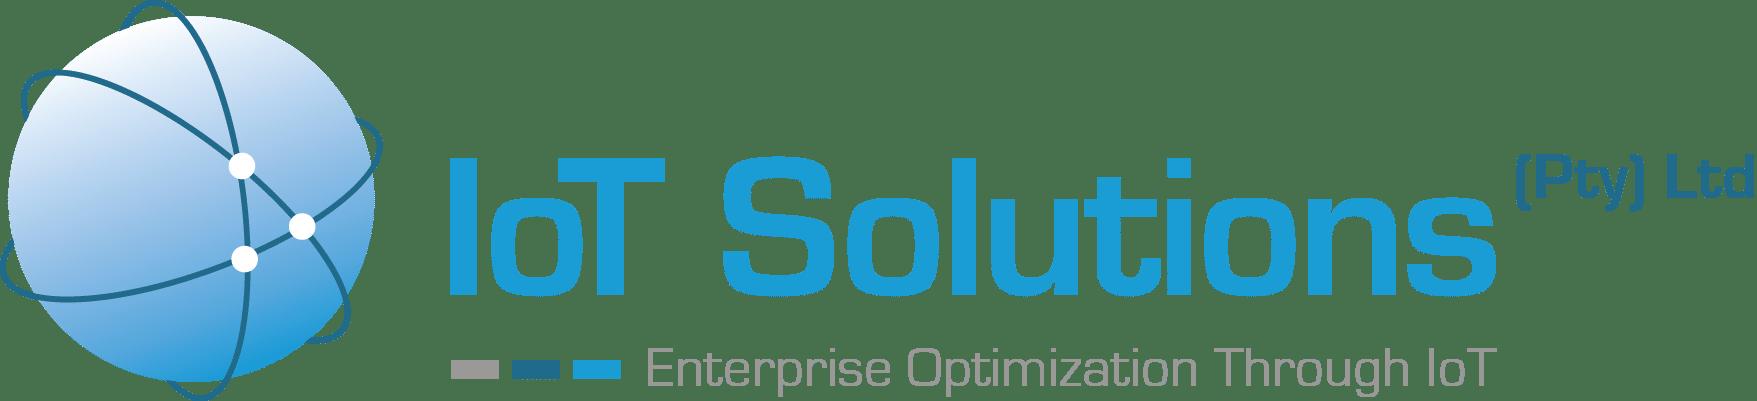 IoT Solutions Logo